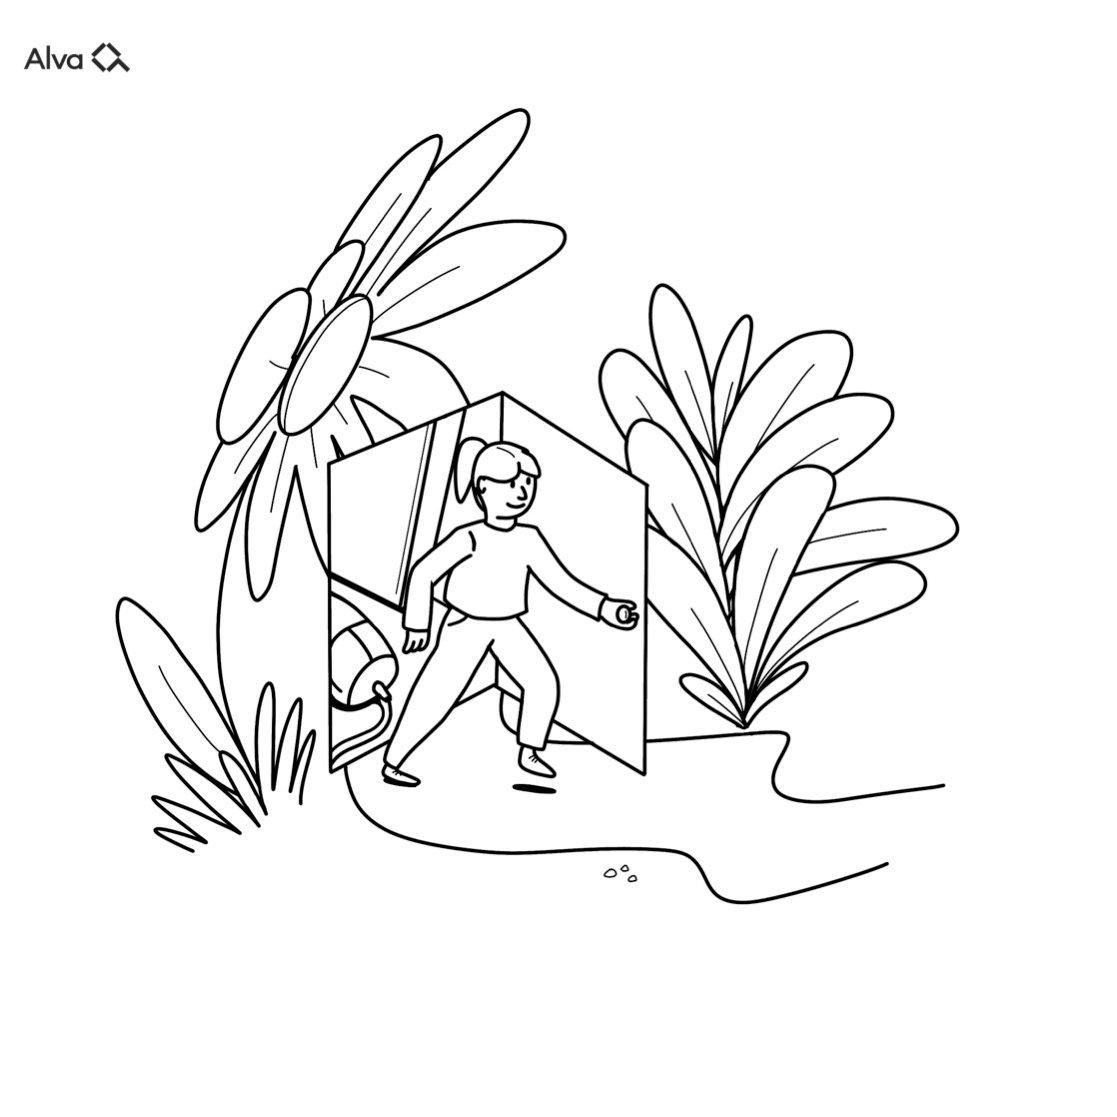 Ingrid_Blogpost_Illustration1-1